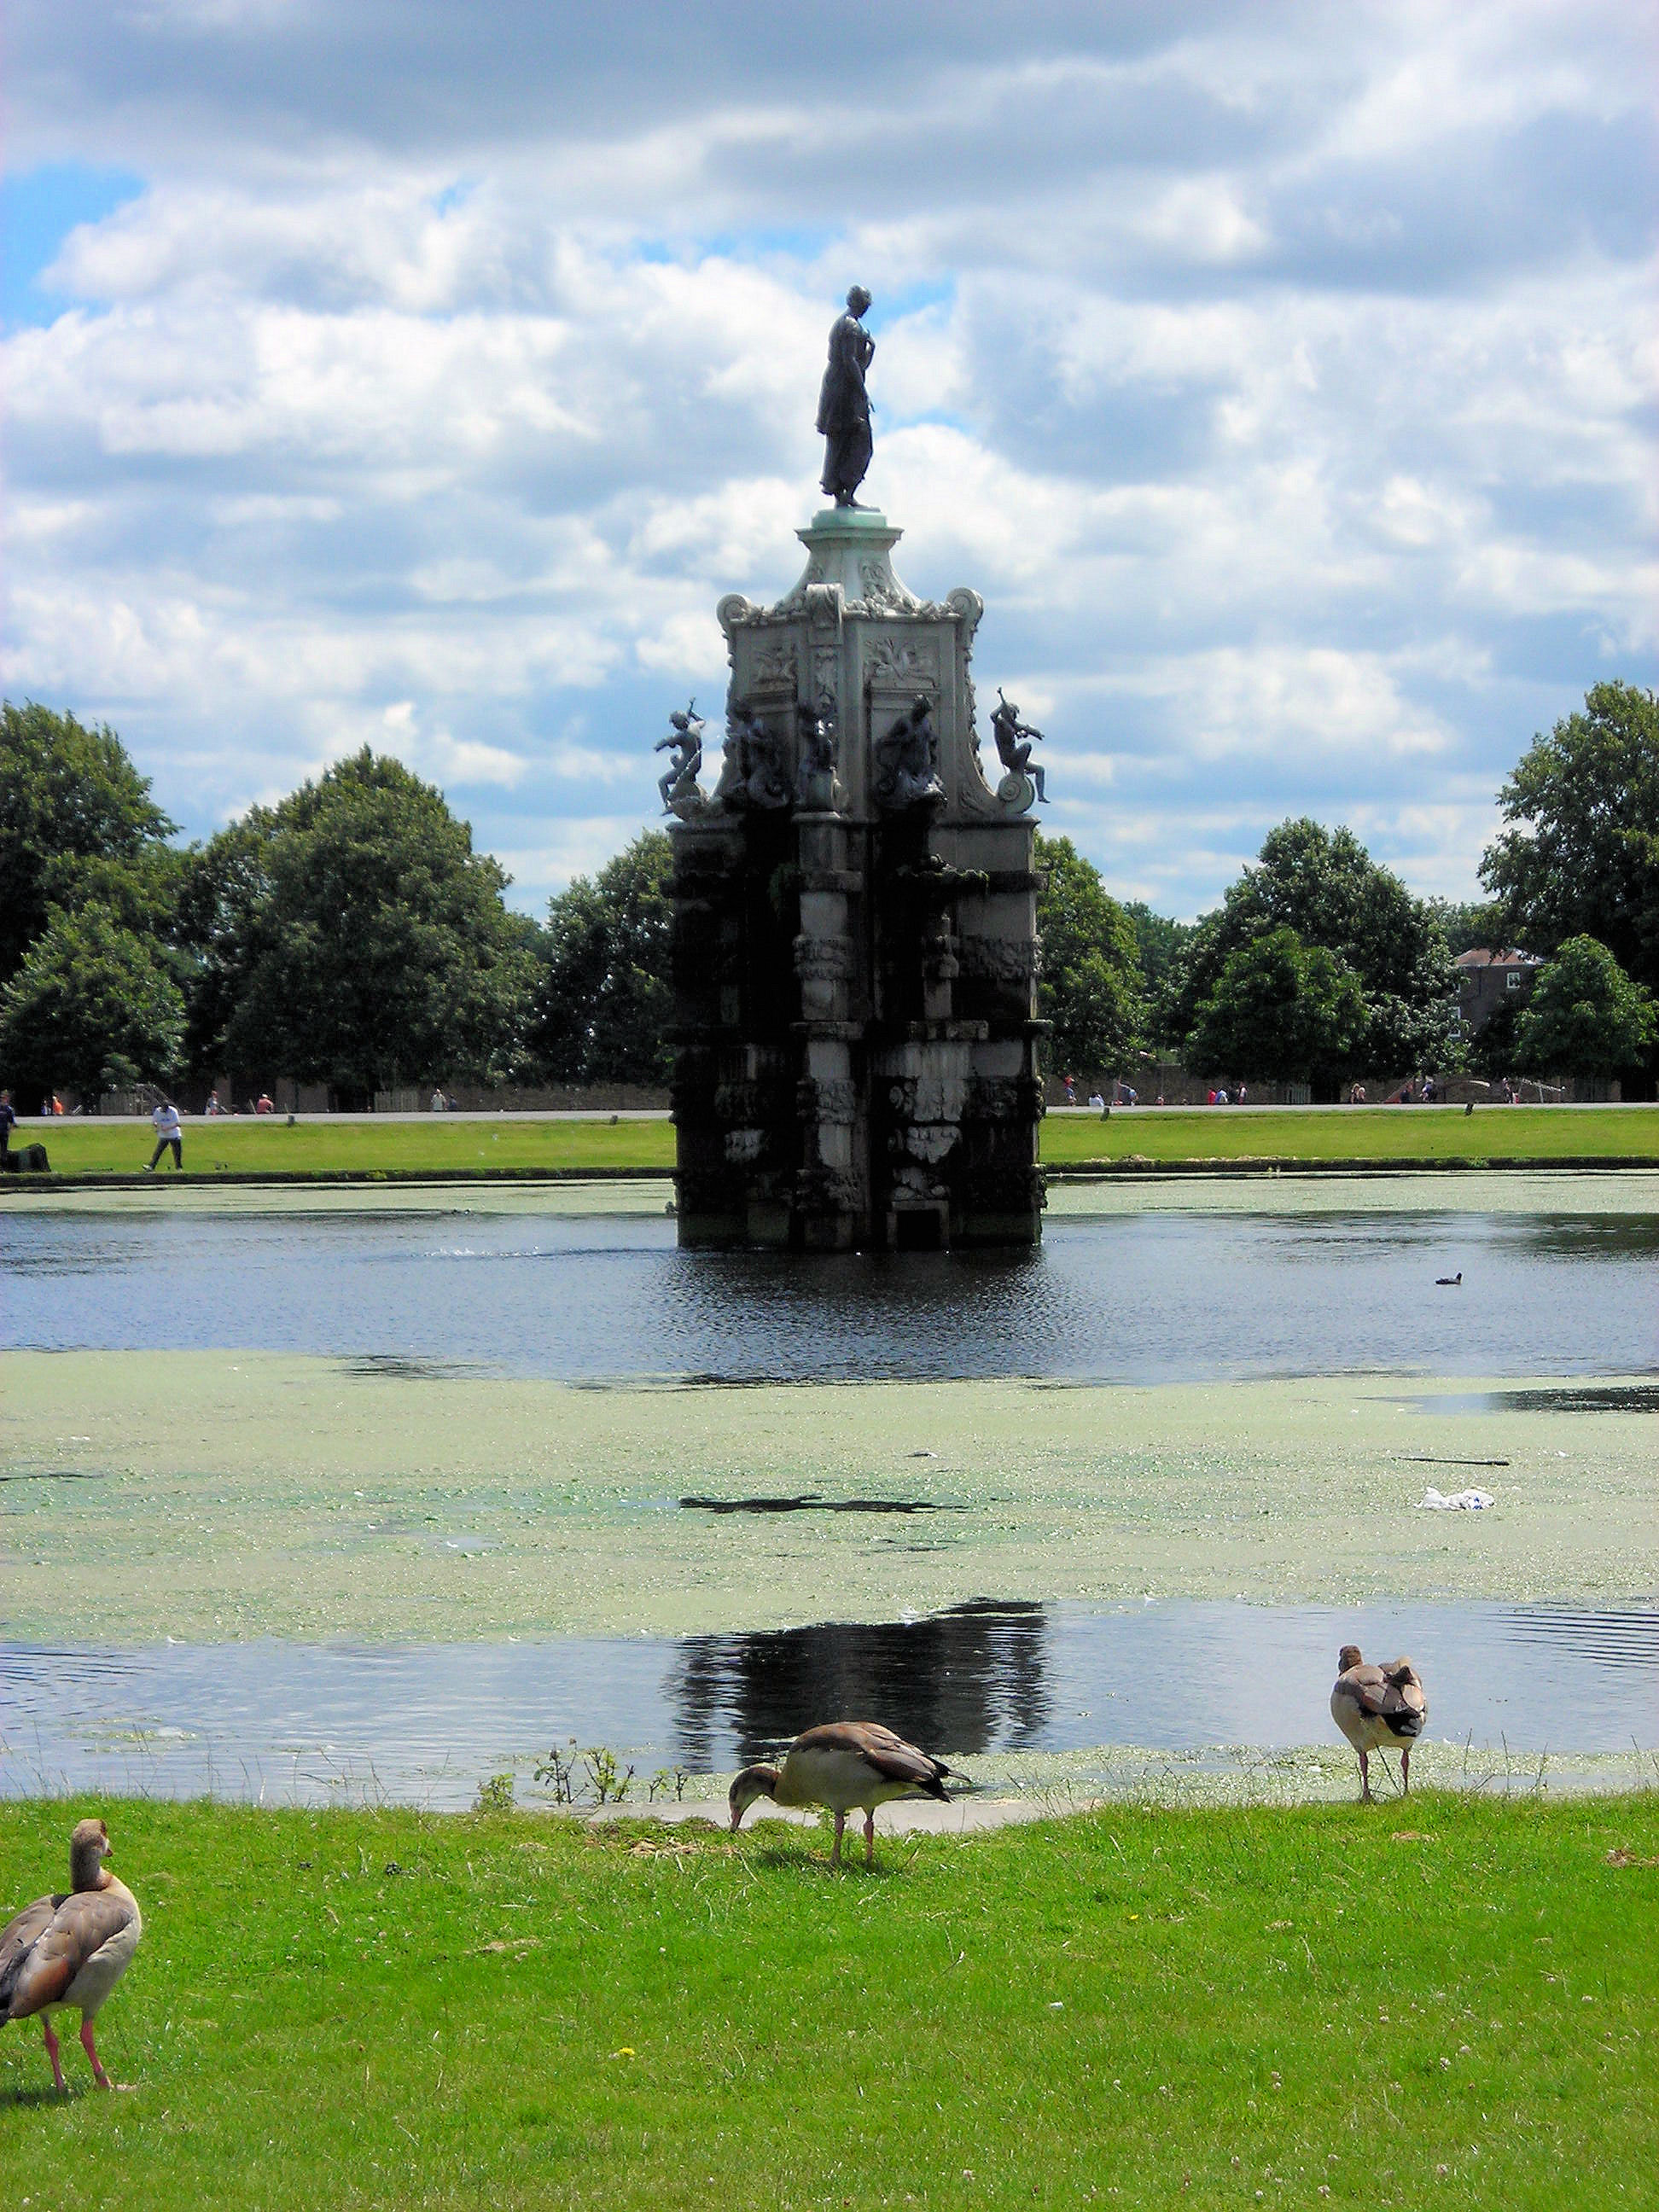 Filethe Arethusa Diana Fountain Bushy Park Surrey